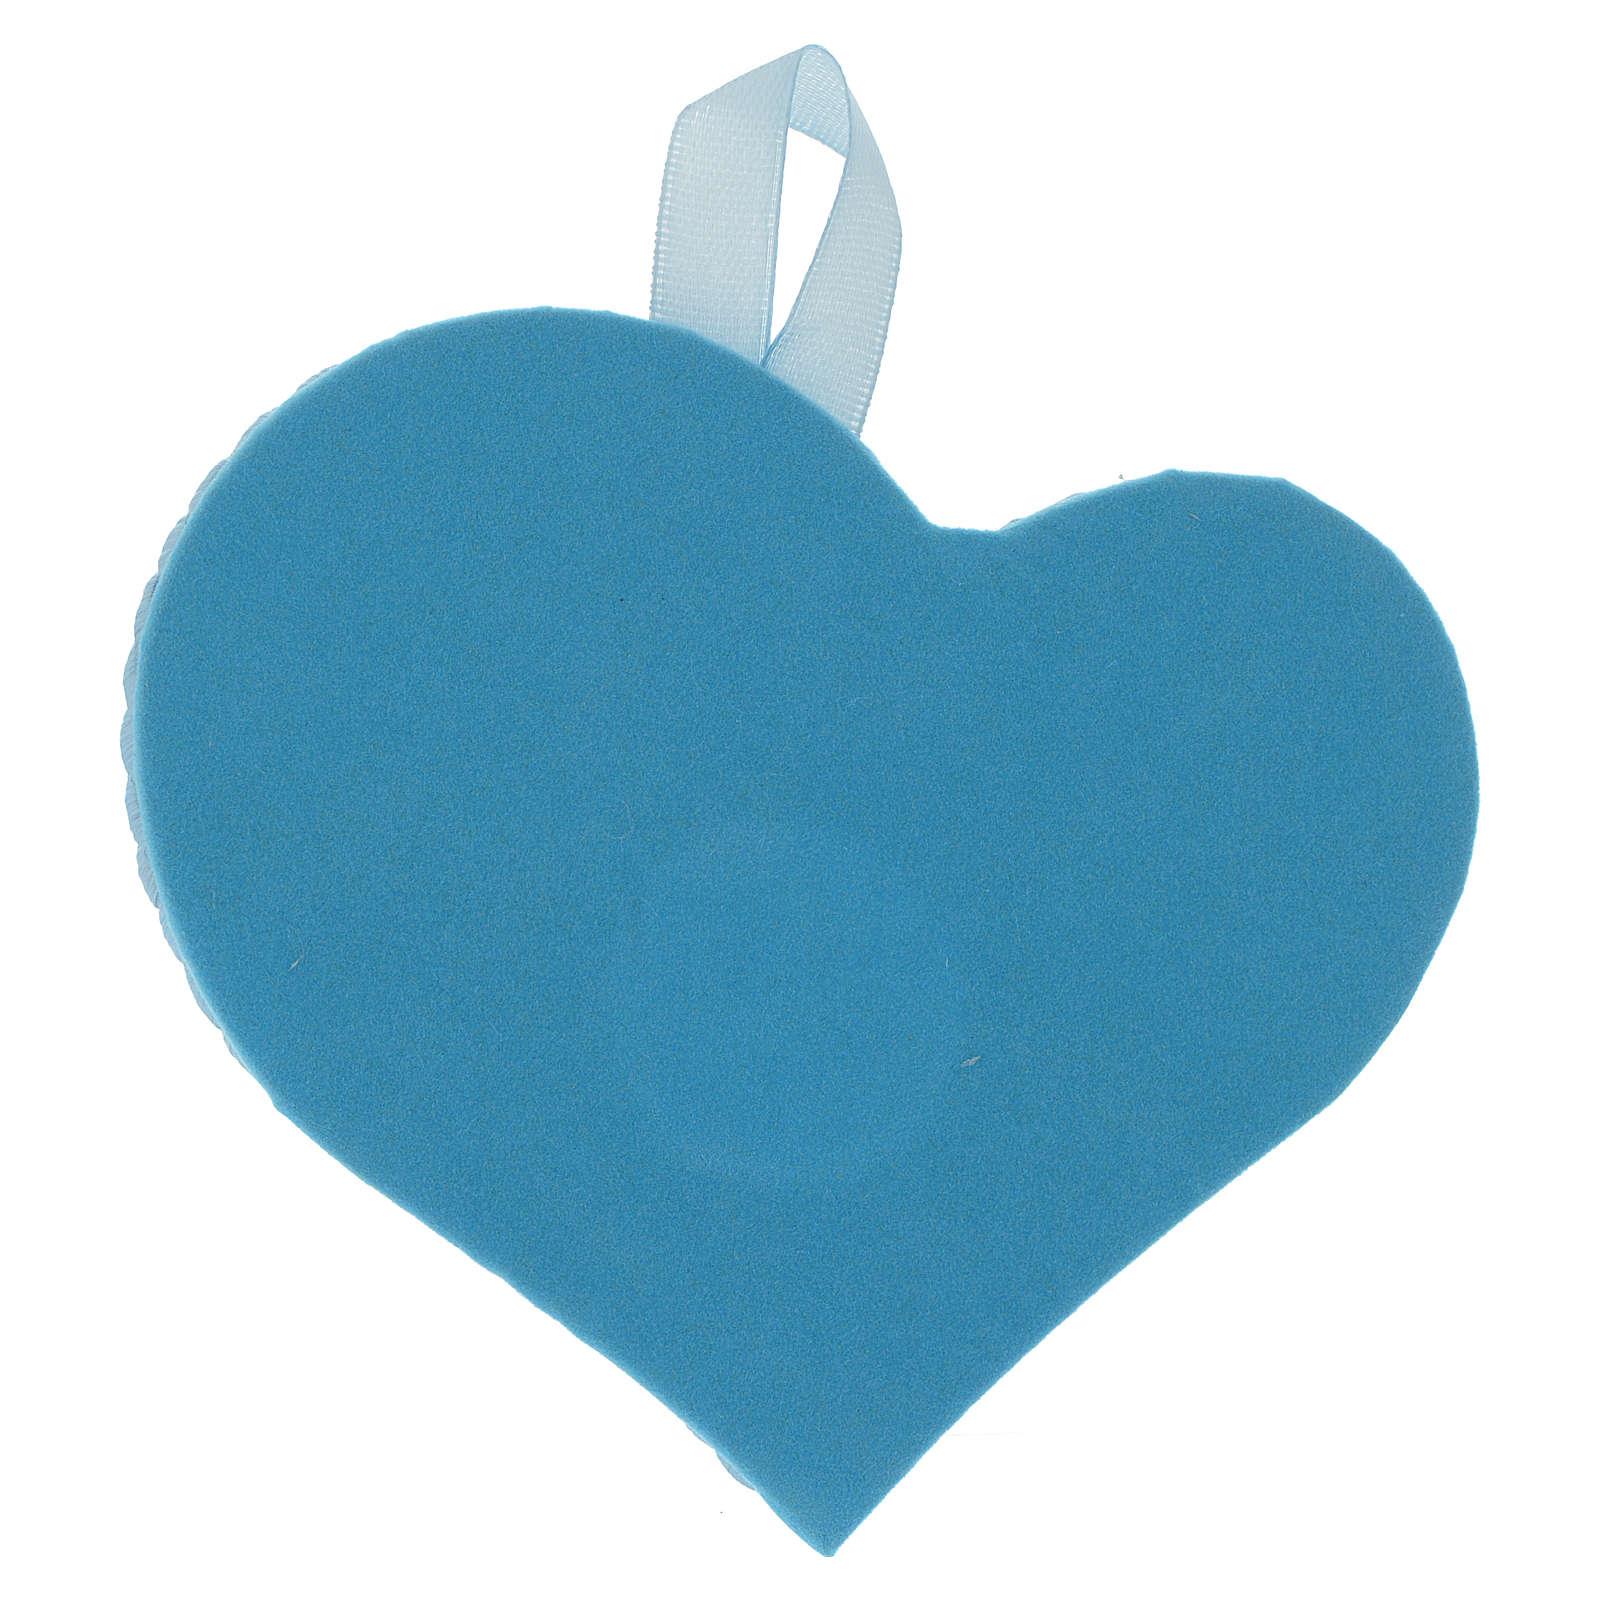 Guardian Angel medallion crib toy in silver heart shape 4